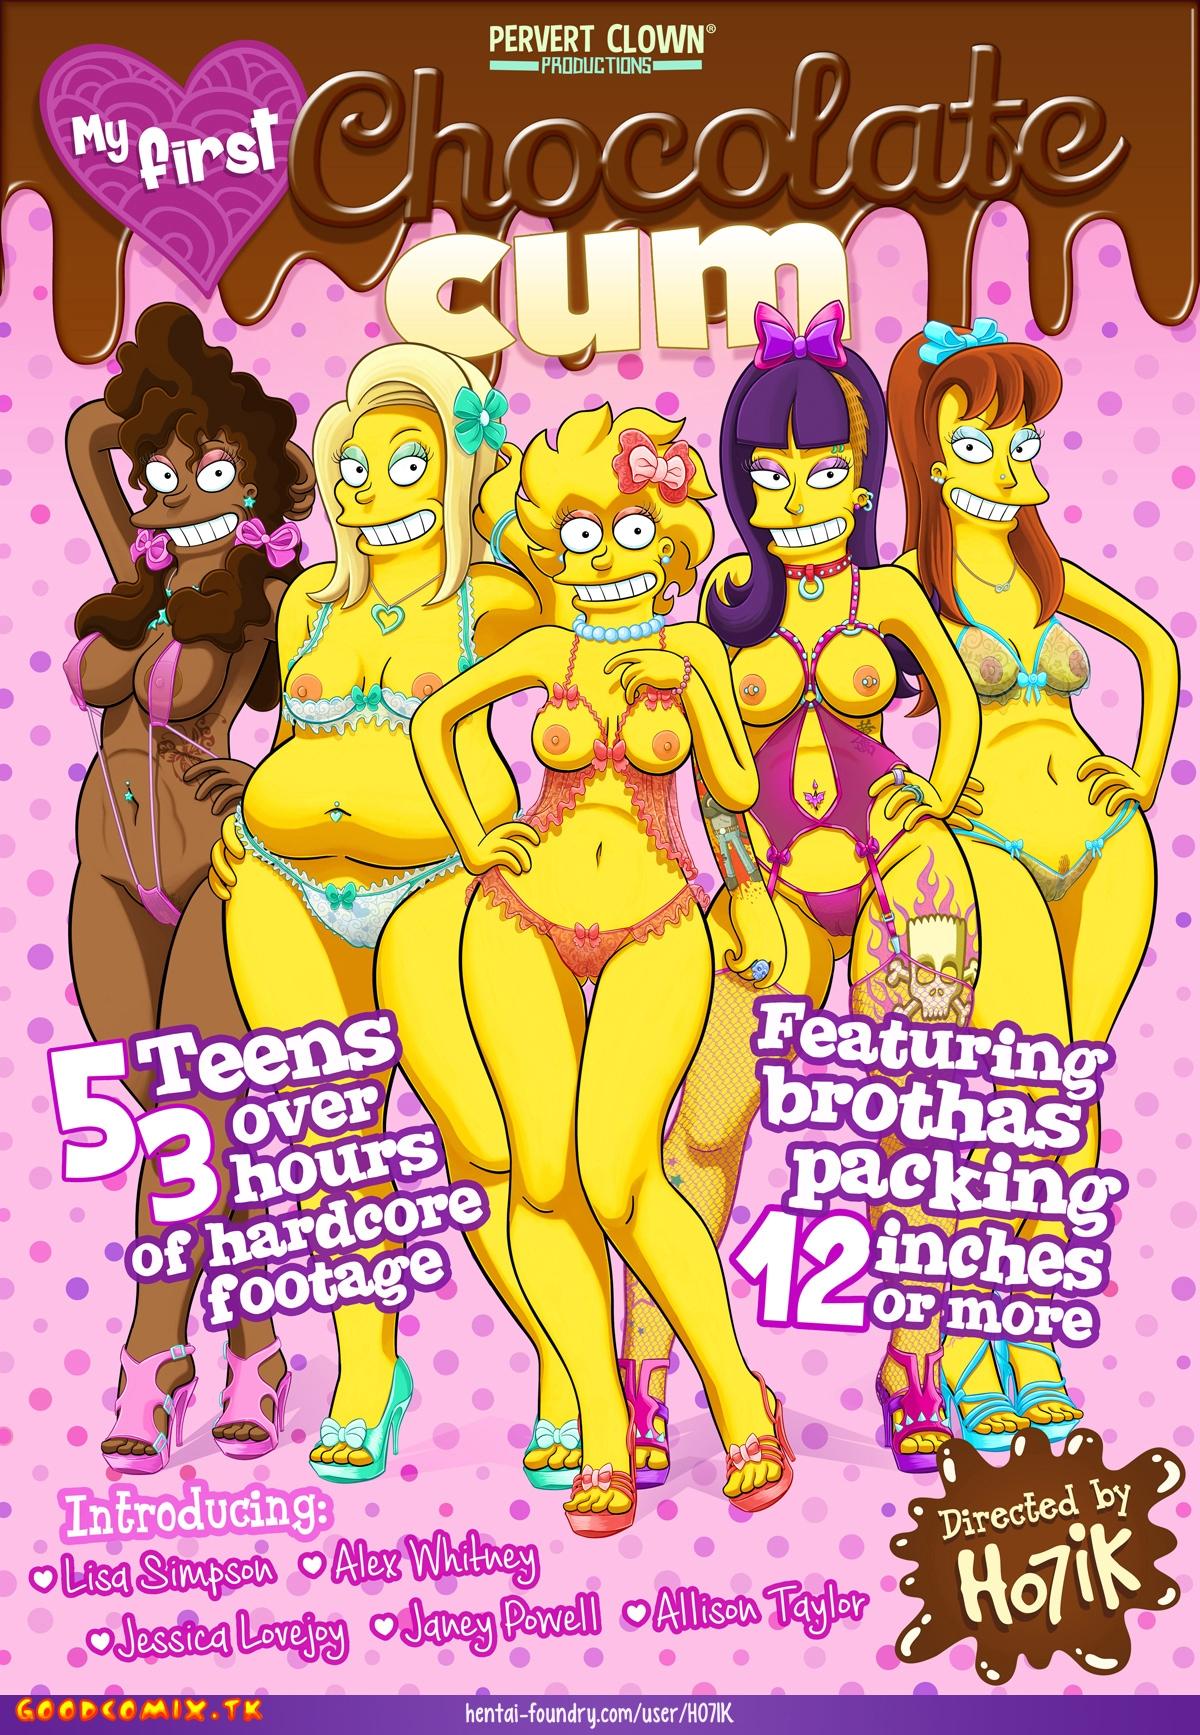 SureFap xxx porno The Simpsons - [Yb-Ho7ik] - My First Chocolate Cum